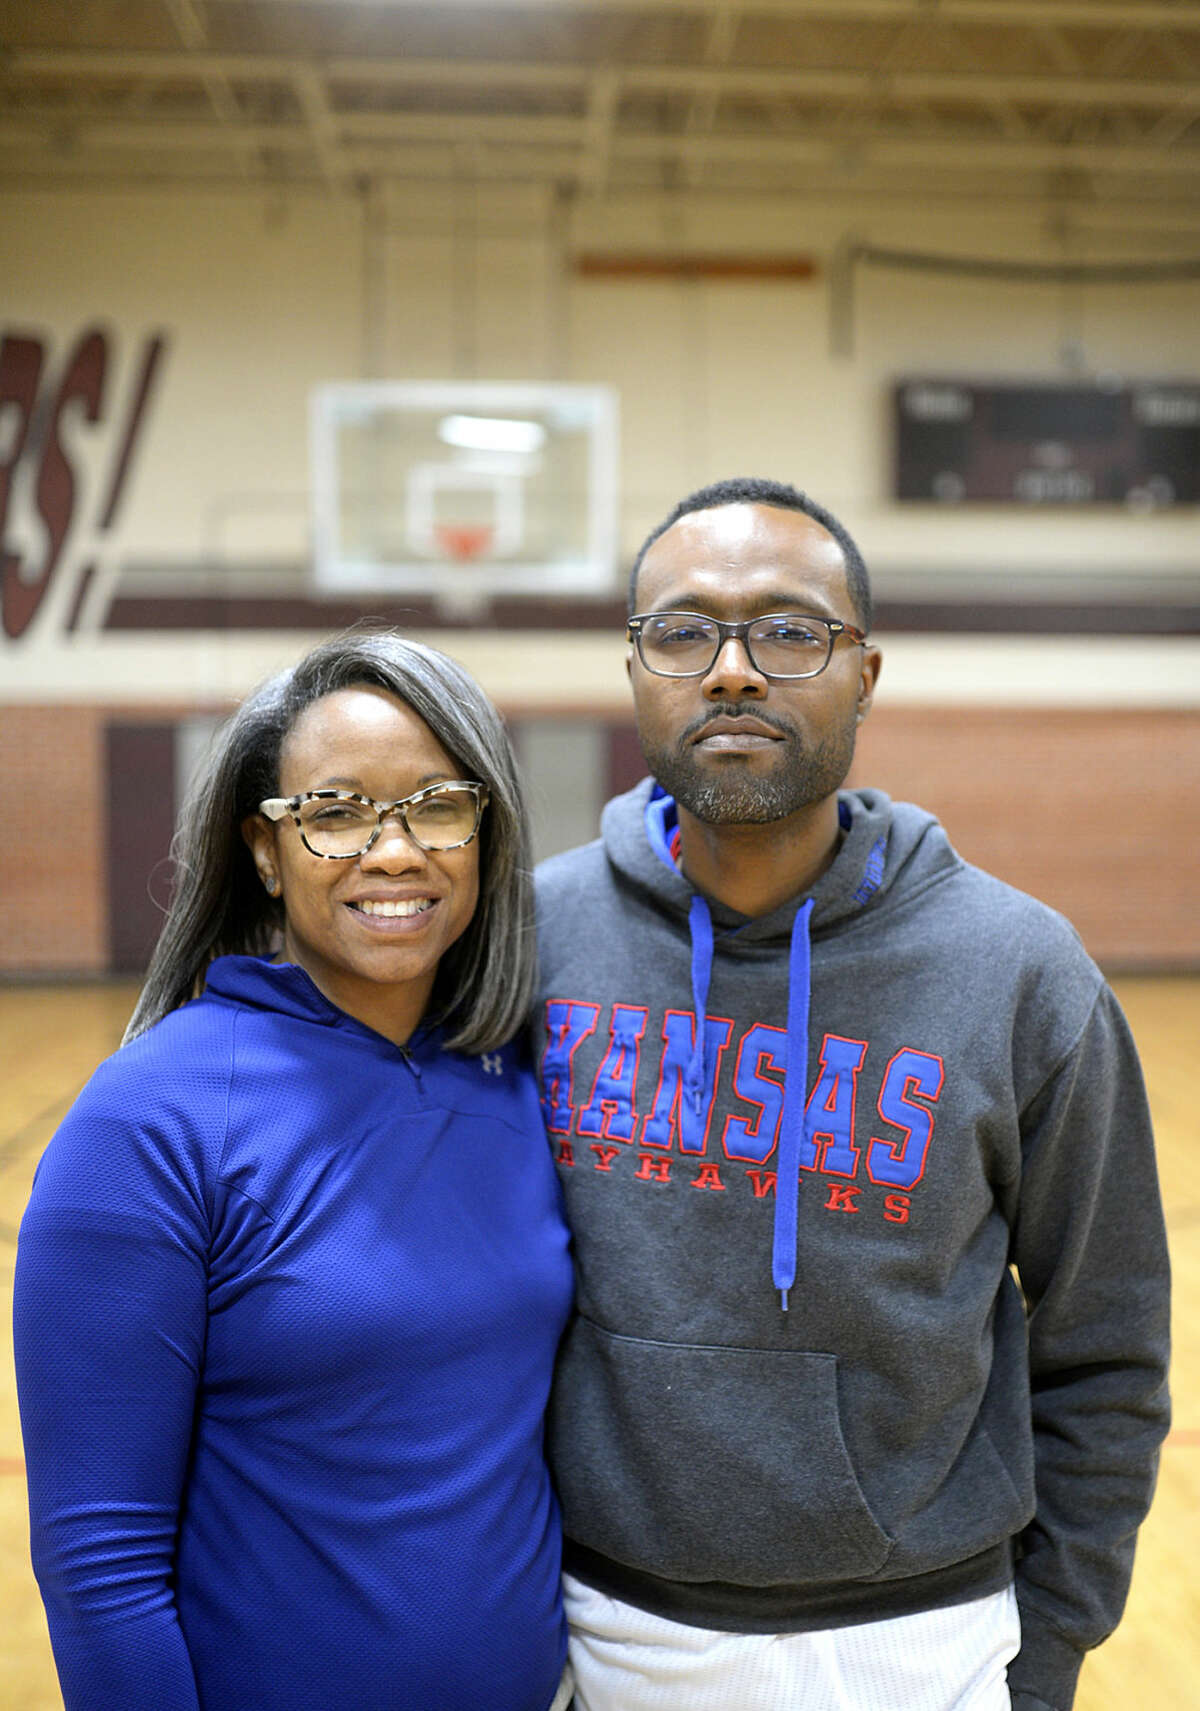 Jumon and Neshun Hailey coach Upward basketball, photographed Wednesday, Feb. 24, 2016, at the Lee High practice gym. James Durbin/Reporter-Telegram